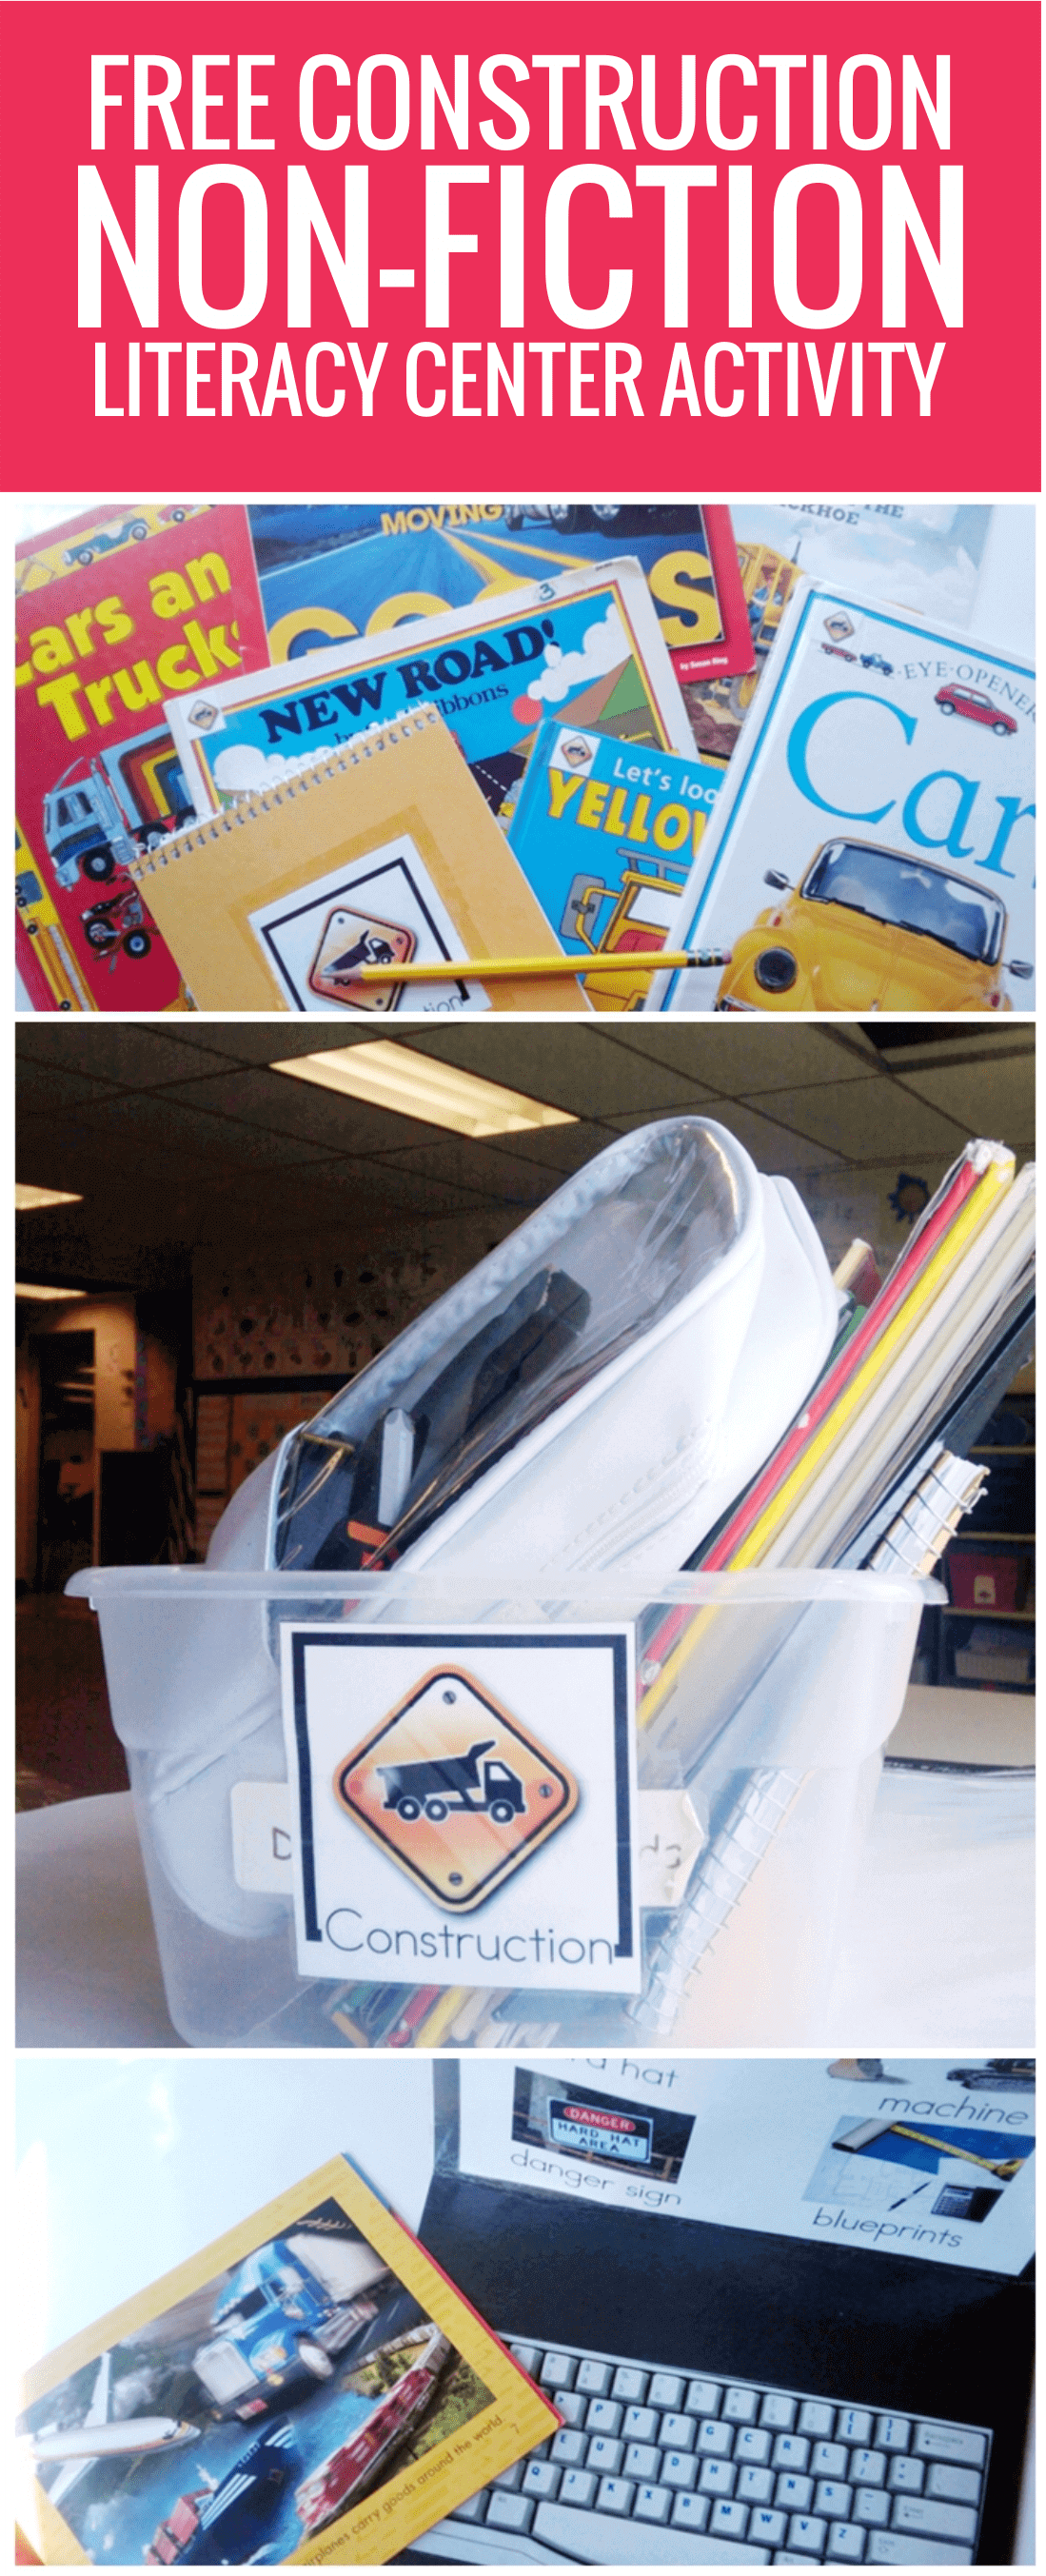 Construction Non-fiction Literacy Center Activity Set